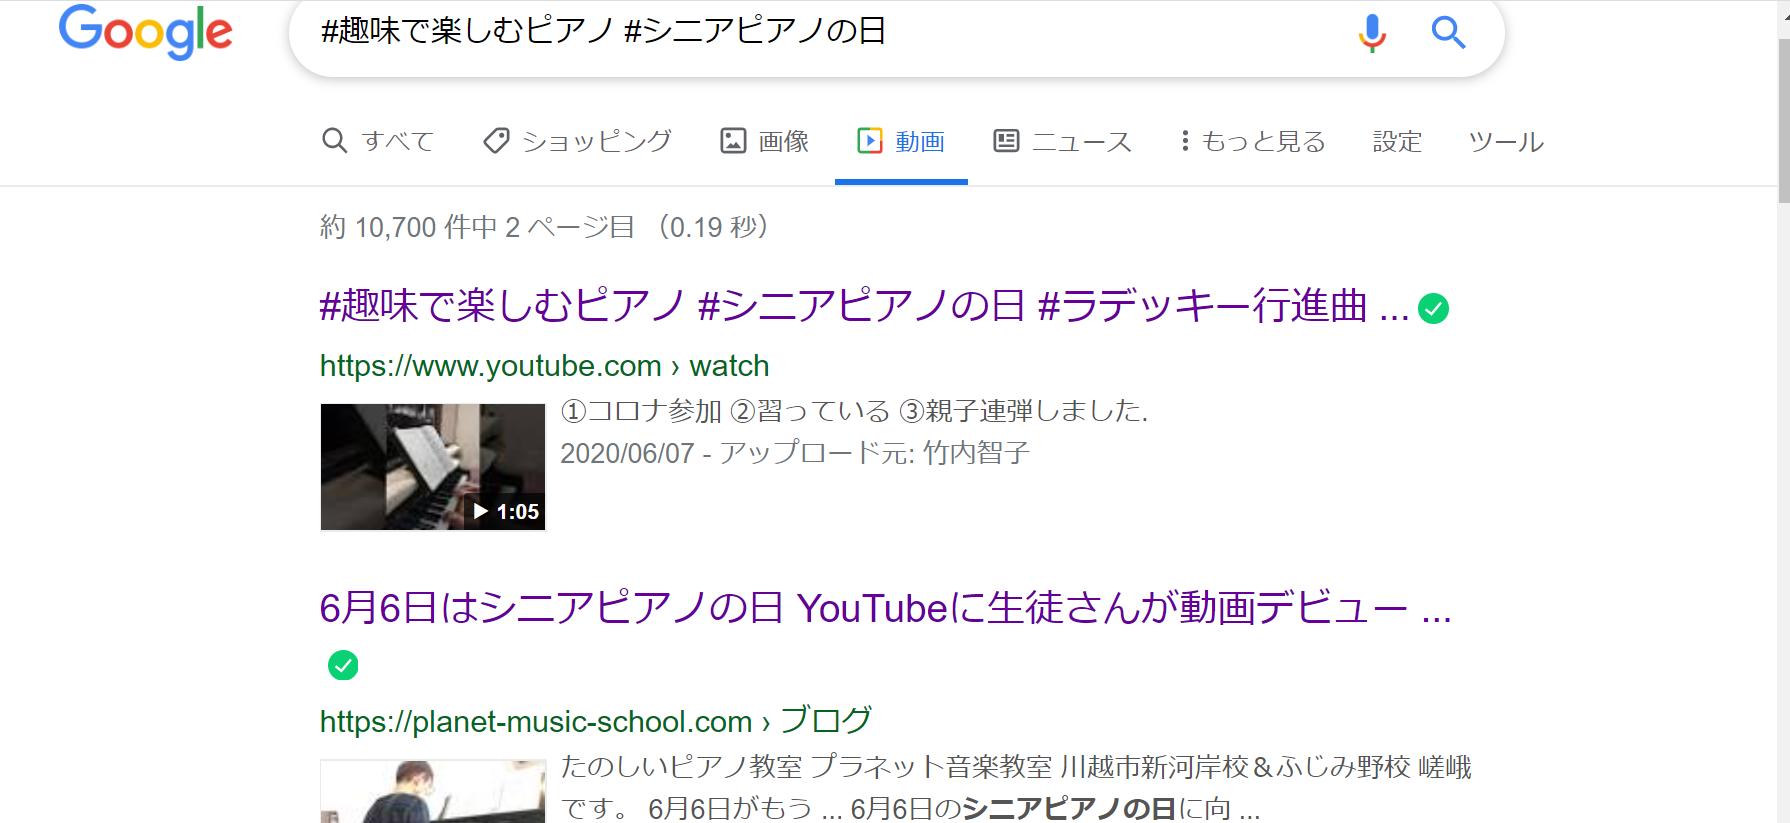 Youtube1 (2)